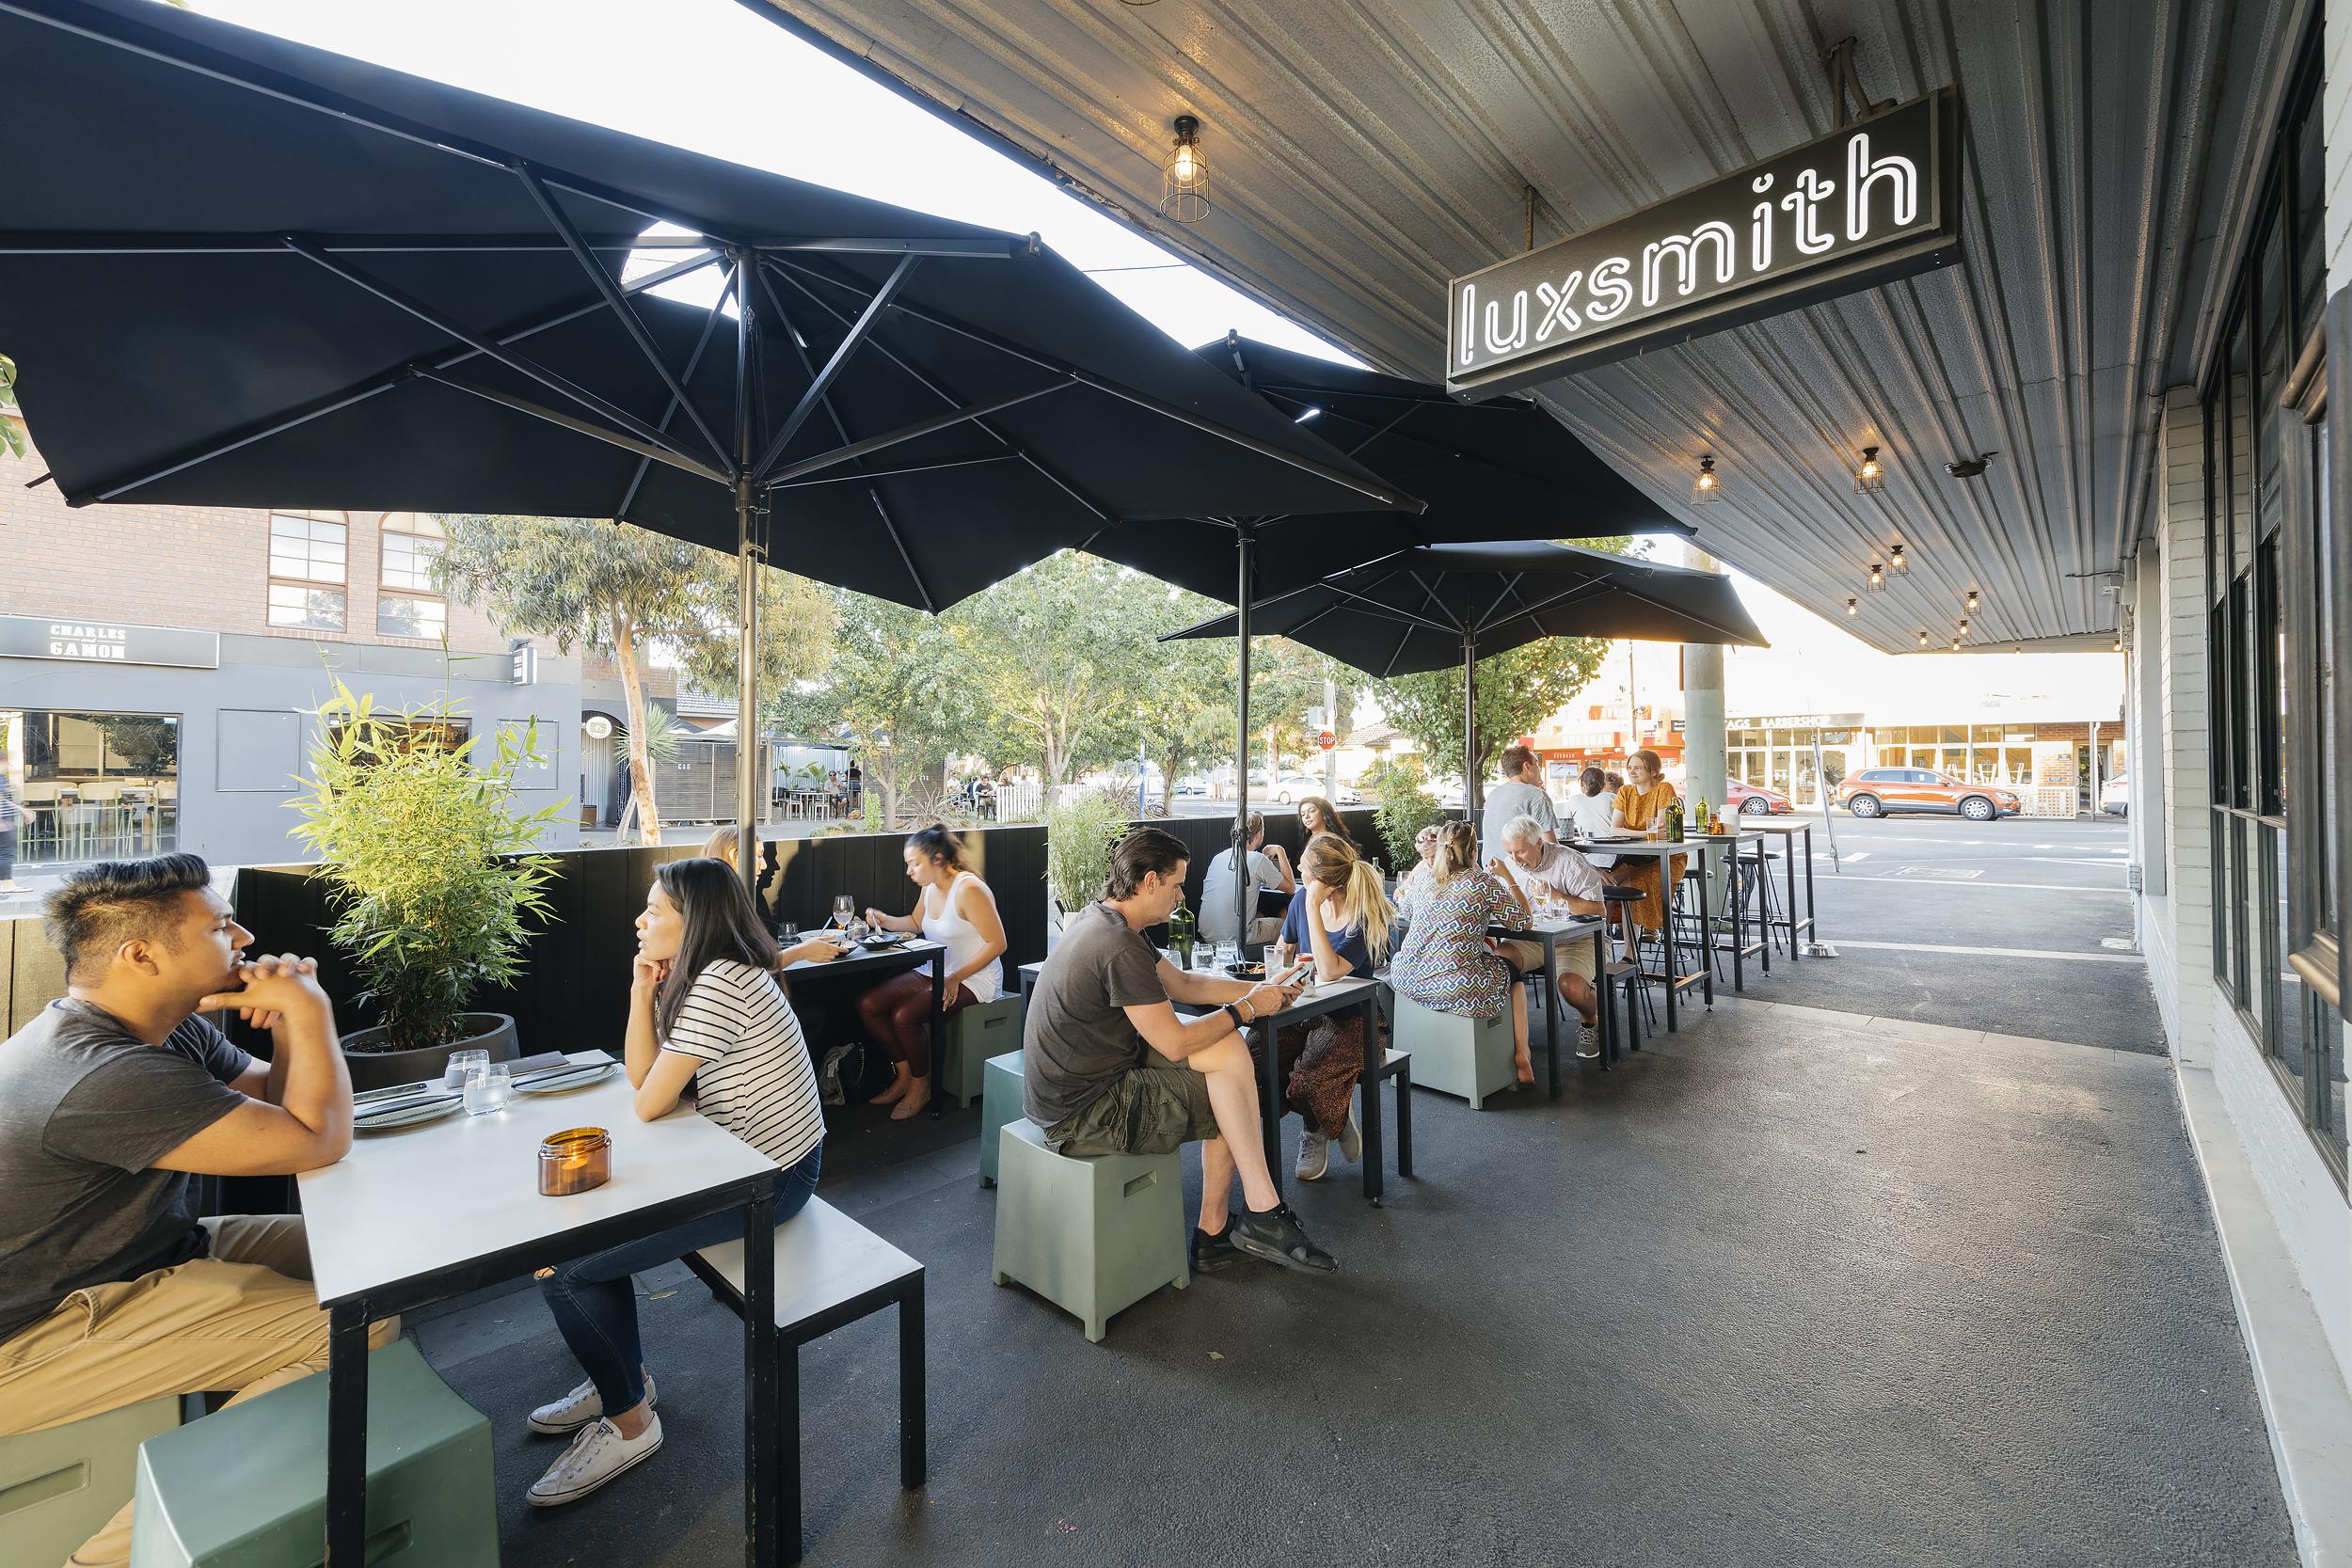 Luxsmith-136.jpg